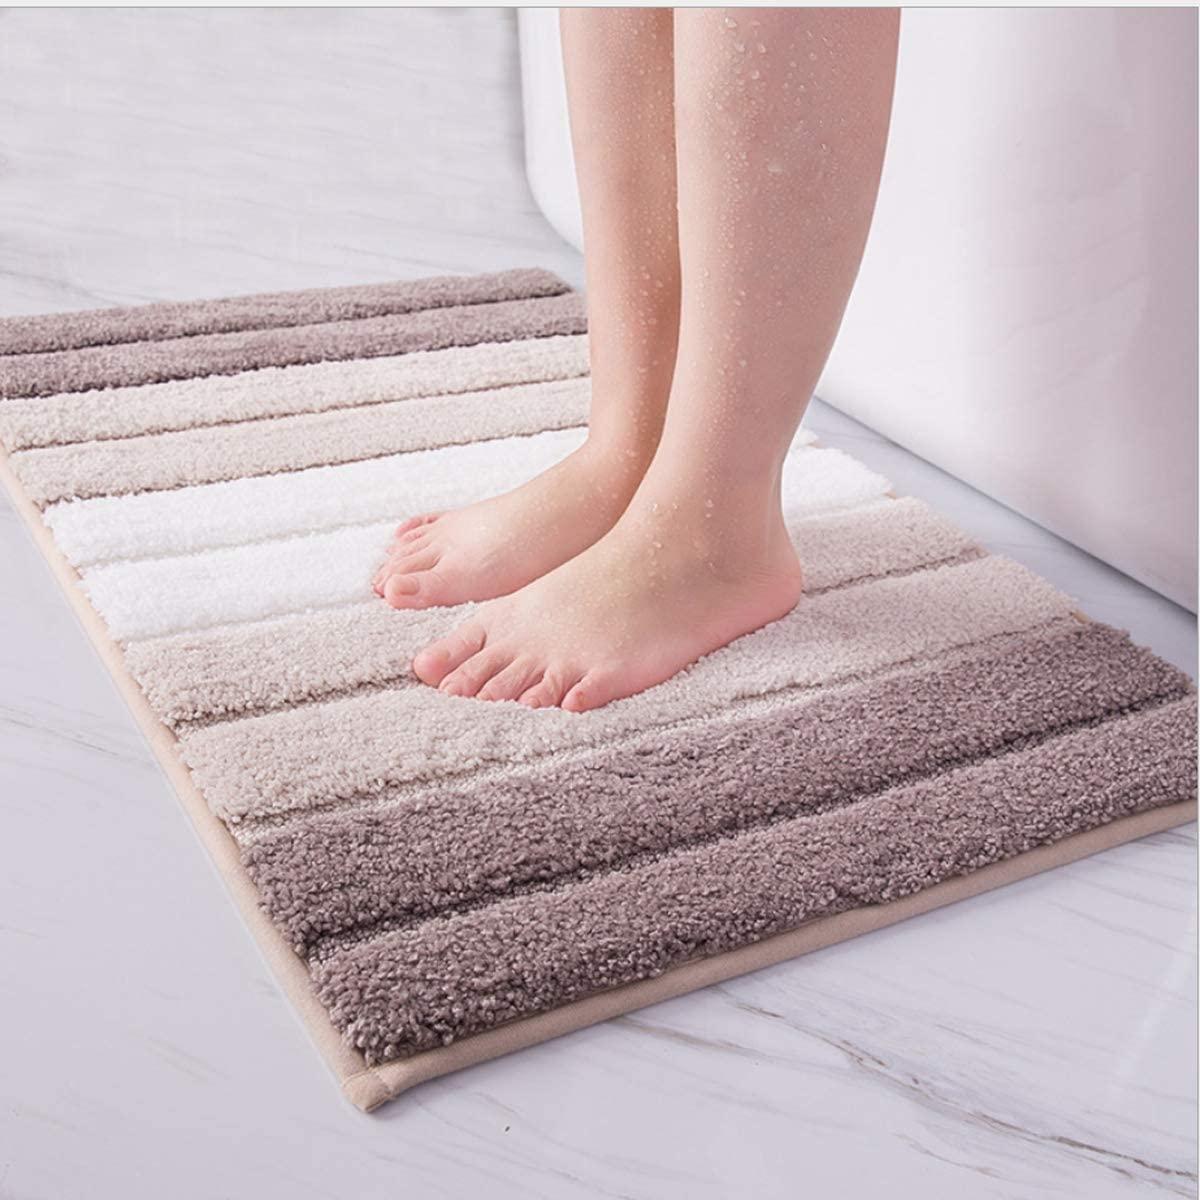 Bath Mats for Bathroom Soft Fluffy Absorbent Microfiber Bathroom Mat Rug Anti-Slip Mat Plush Carpet for Bathroom, Can Be Used in Shower Room, Living Room.Machine Bathroom Mat (18X26inch, Beige)